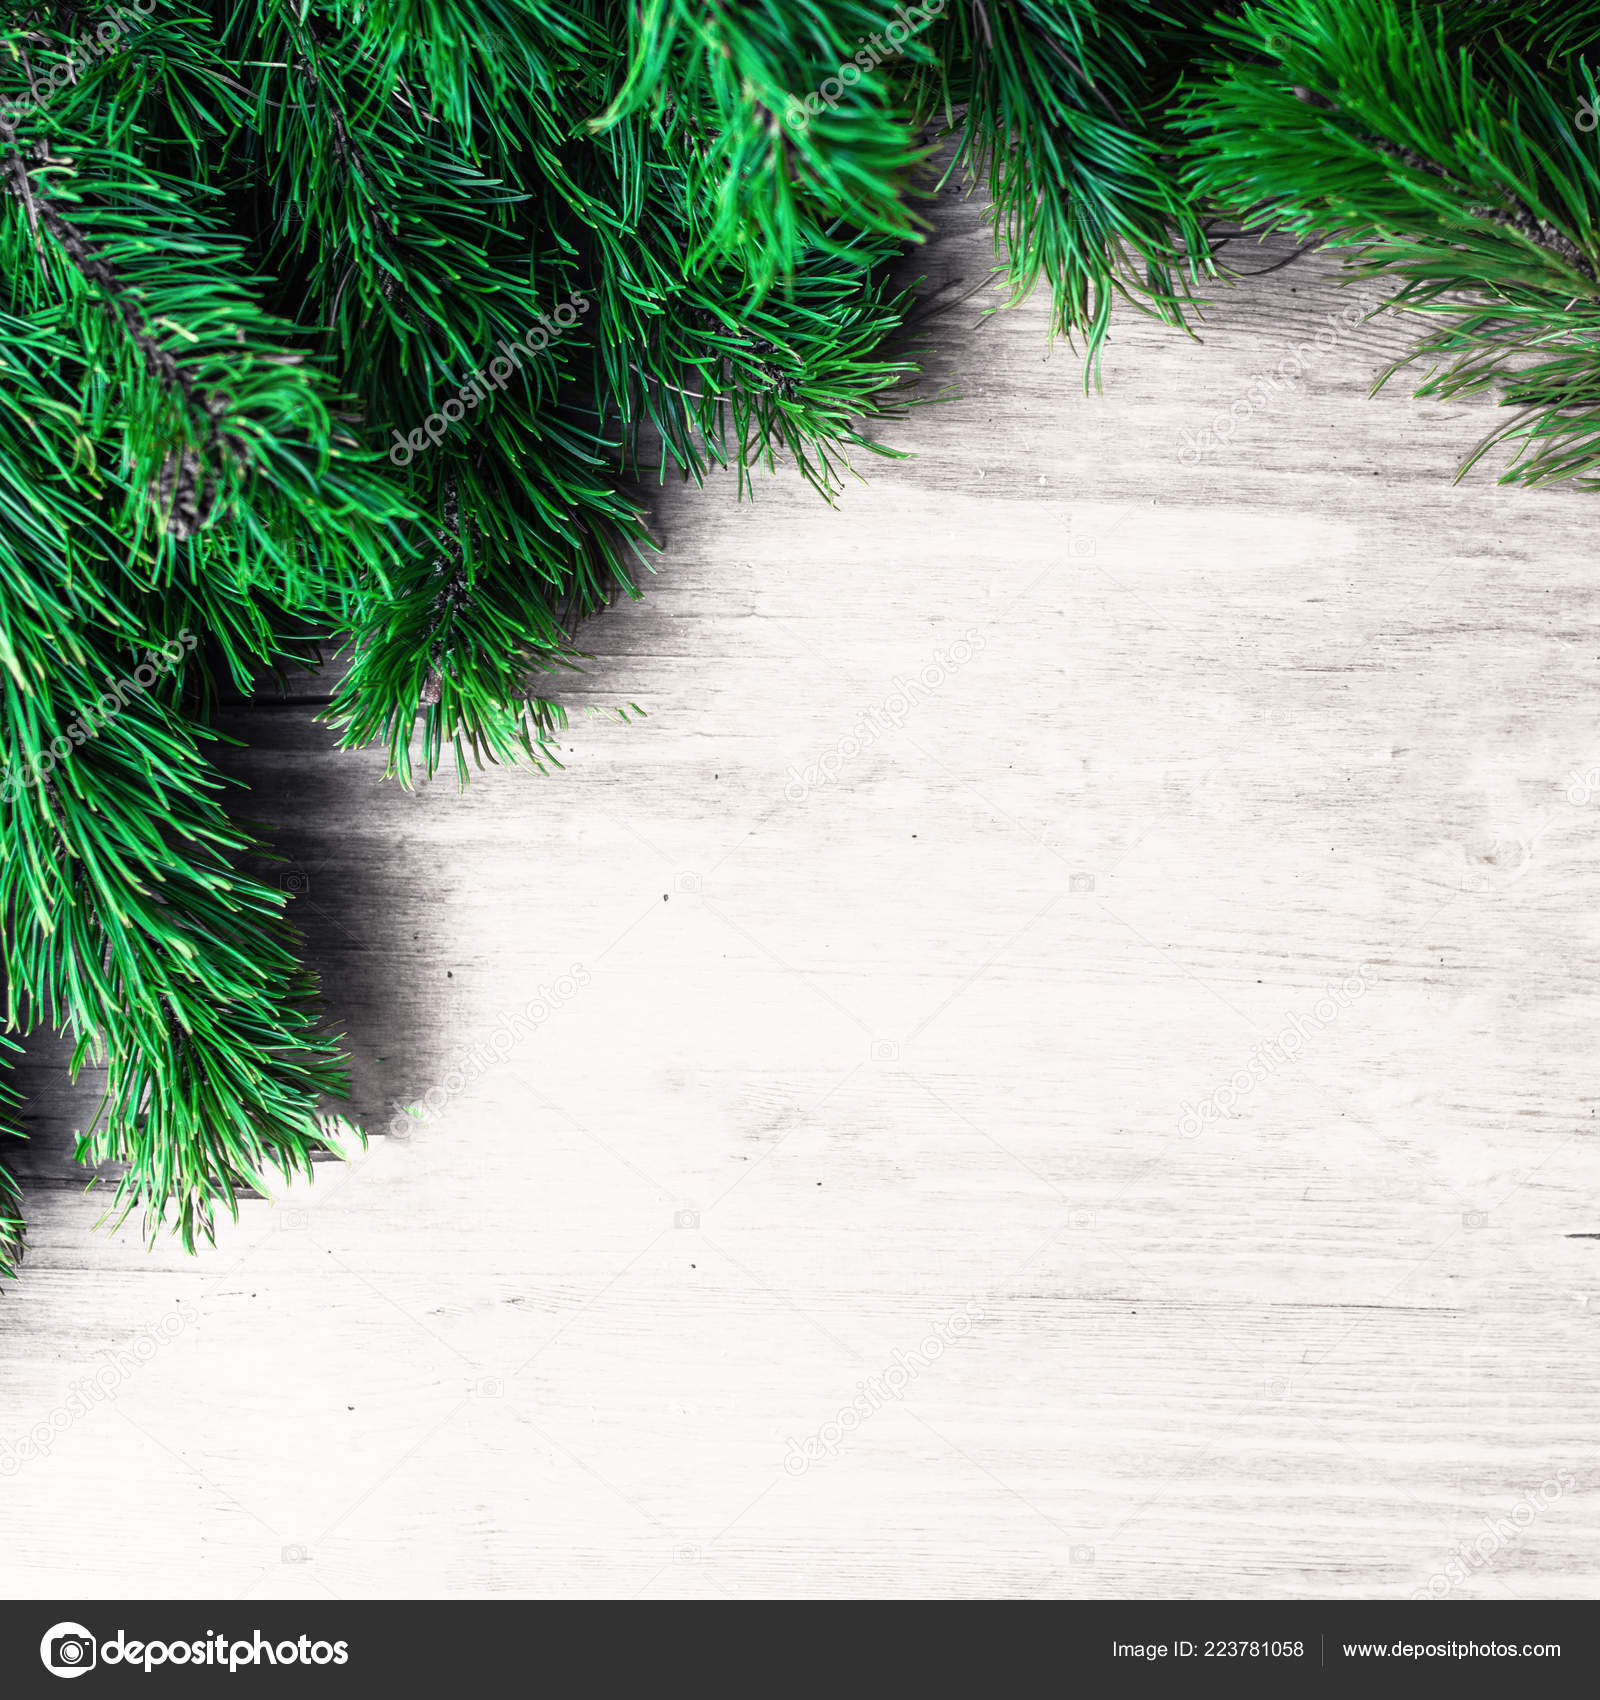 depositphotos 223781058 stock photo christmas frame fir tree branches